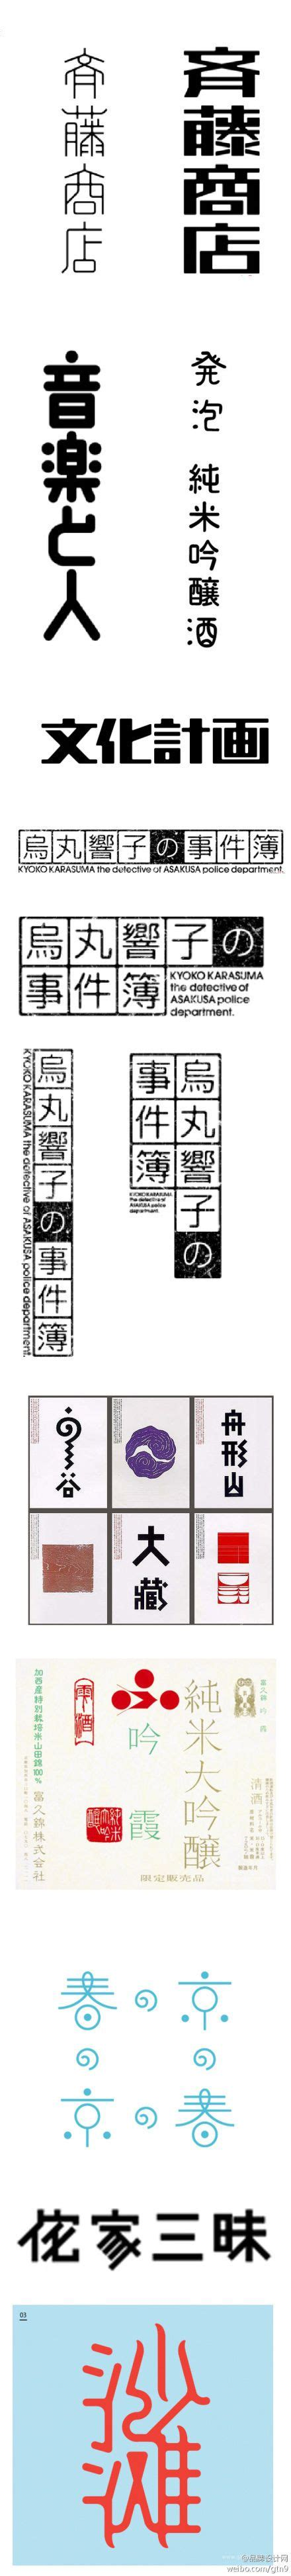 visitor pattern variations chinese kanji font variations www kataaro com font